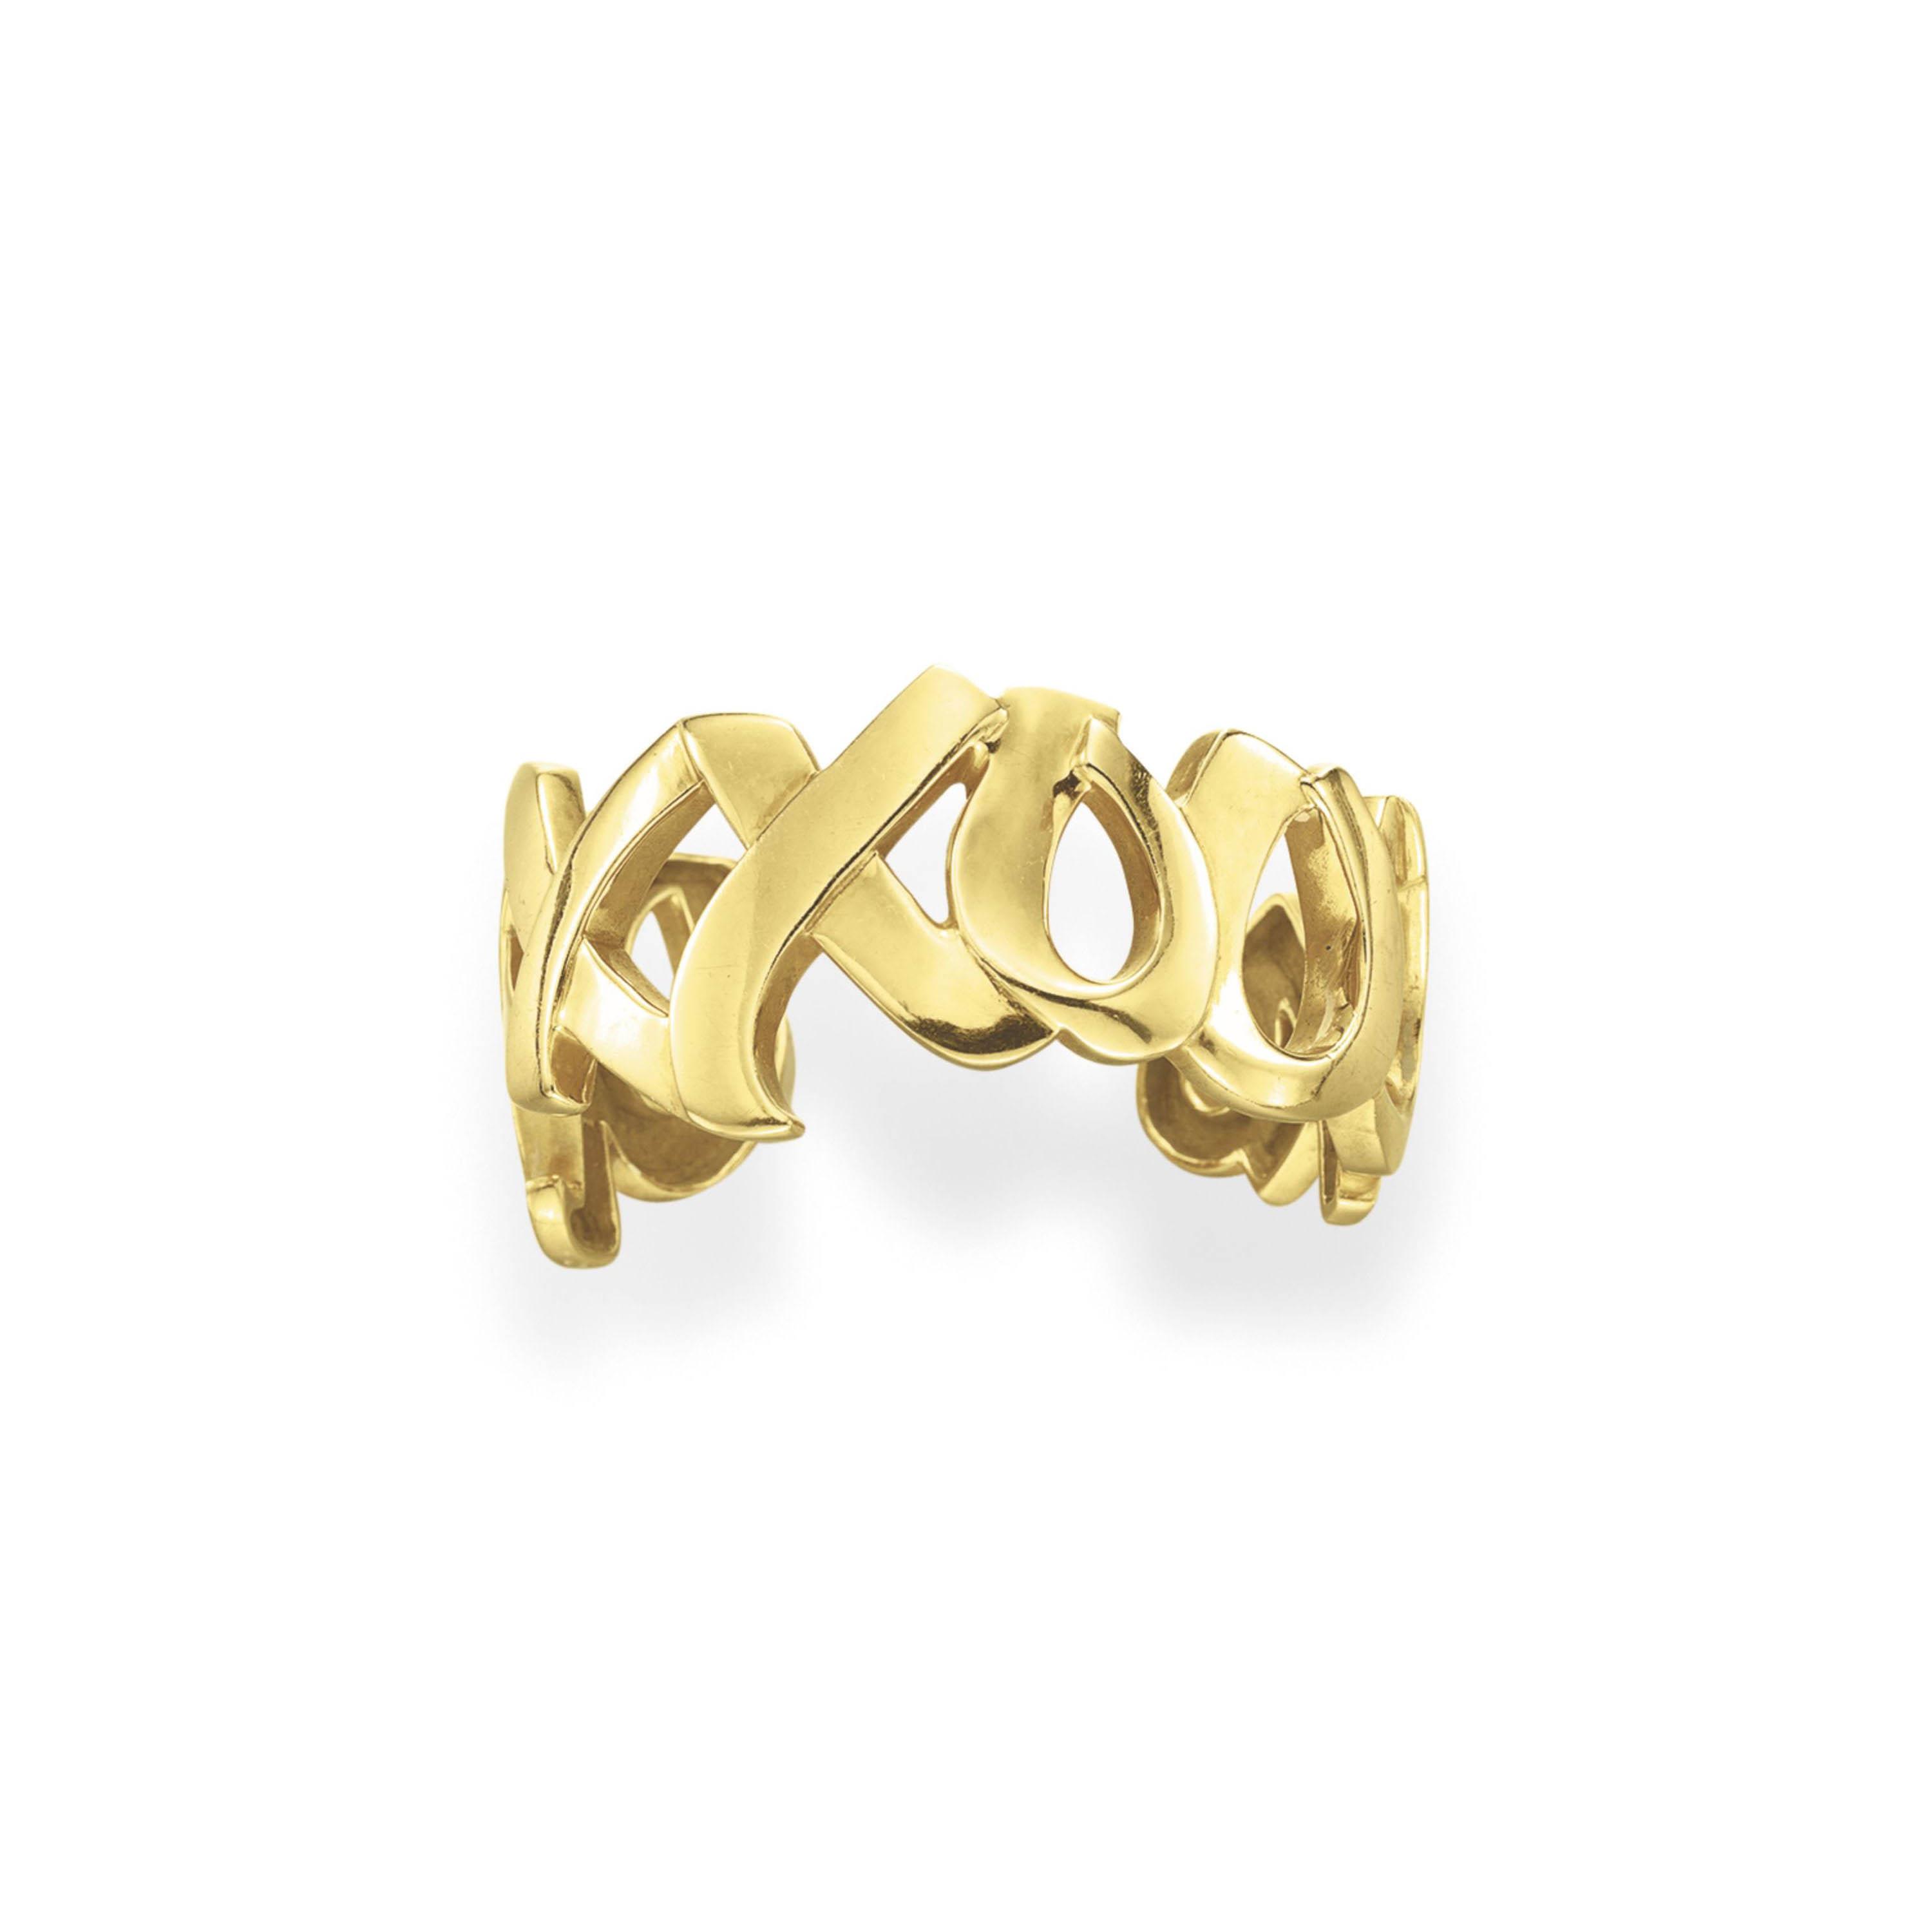 A GOLD CUFF BRACELET, BY PALOMA PICASSO, TIFFANY & CO.